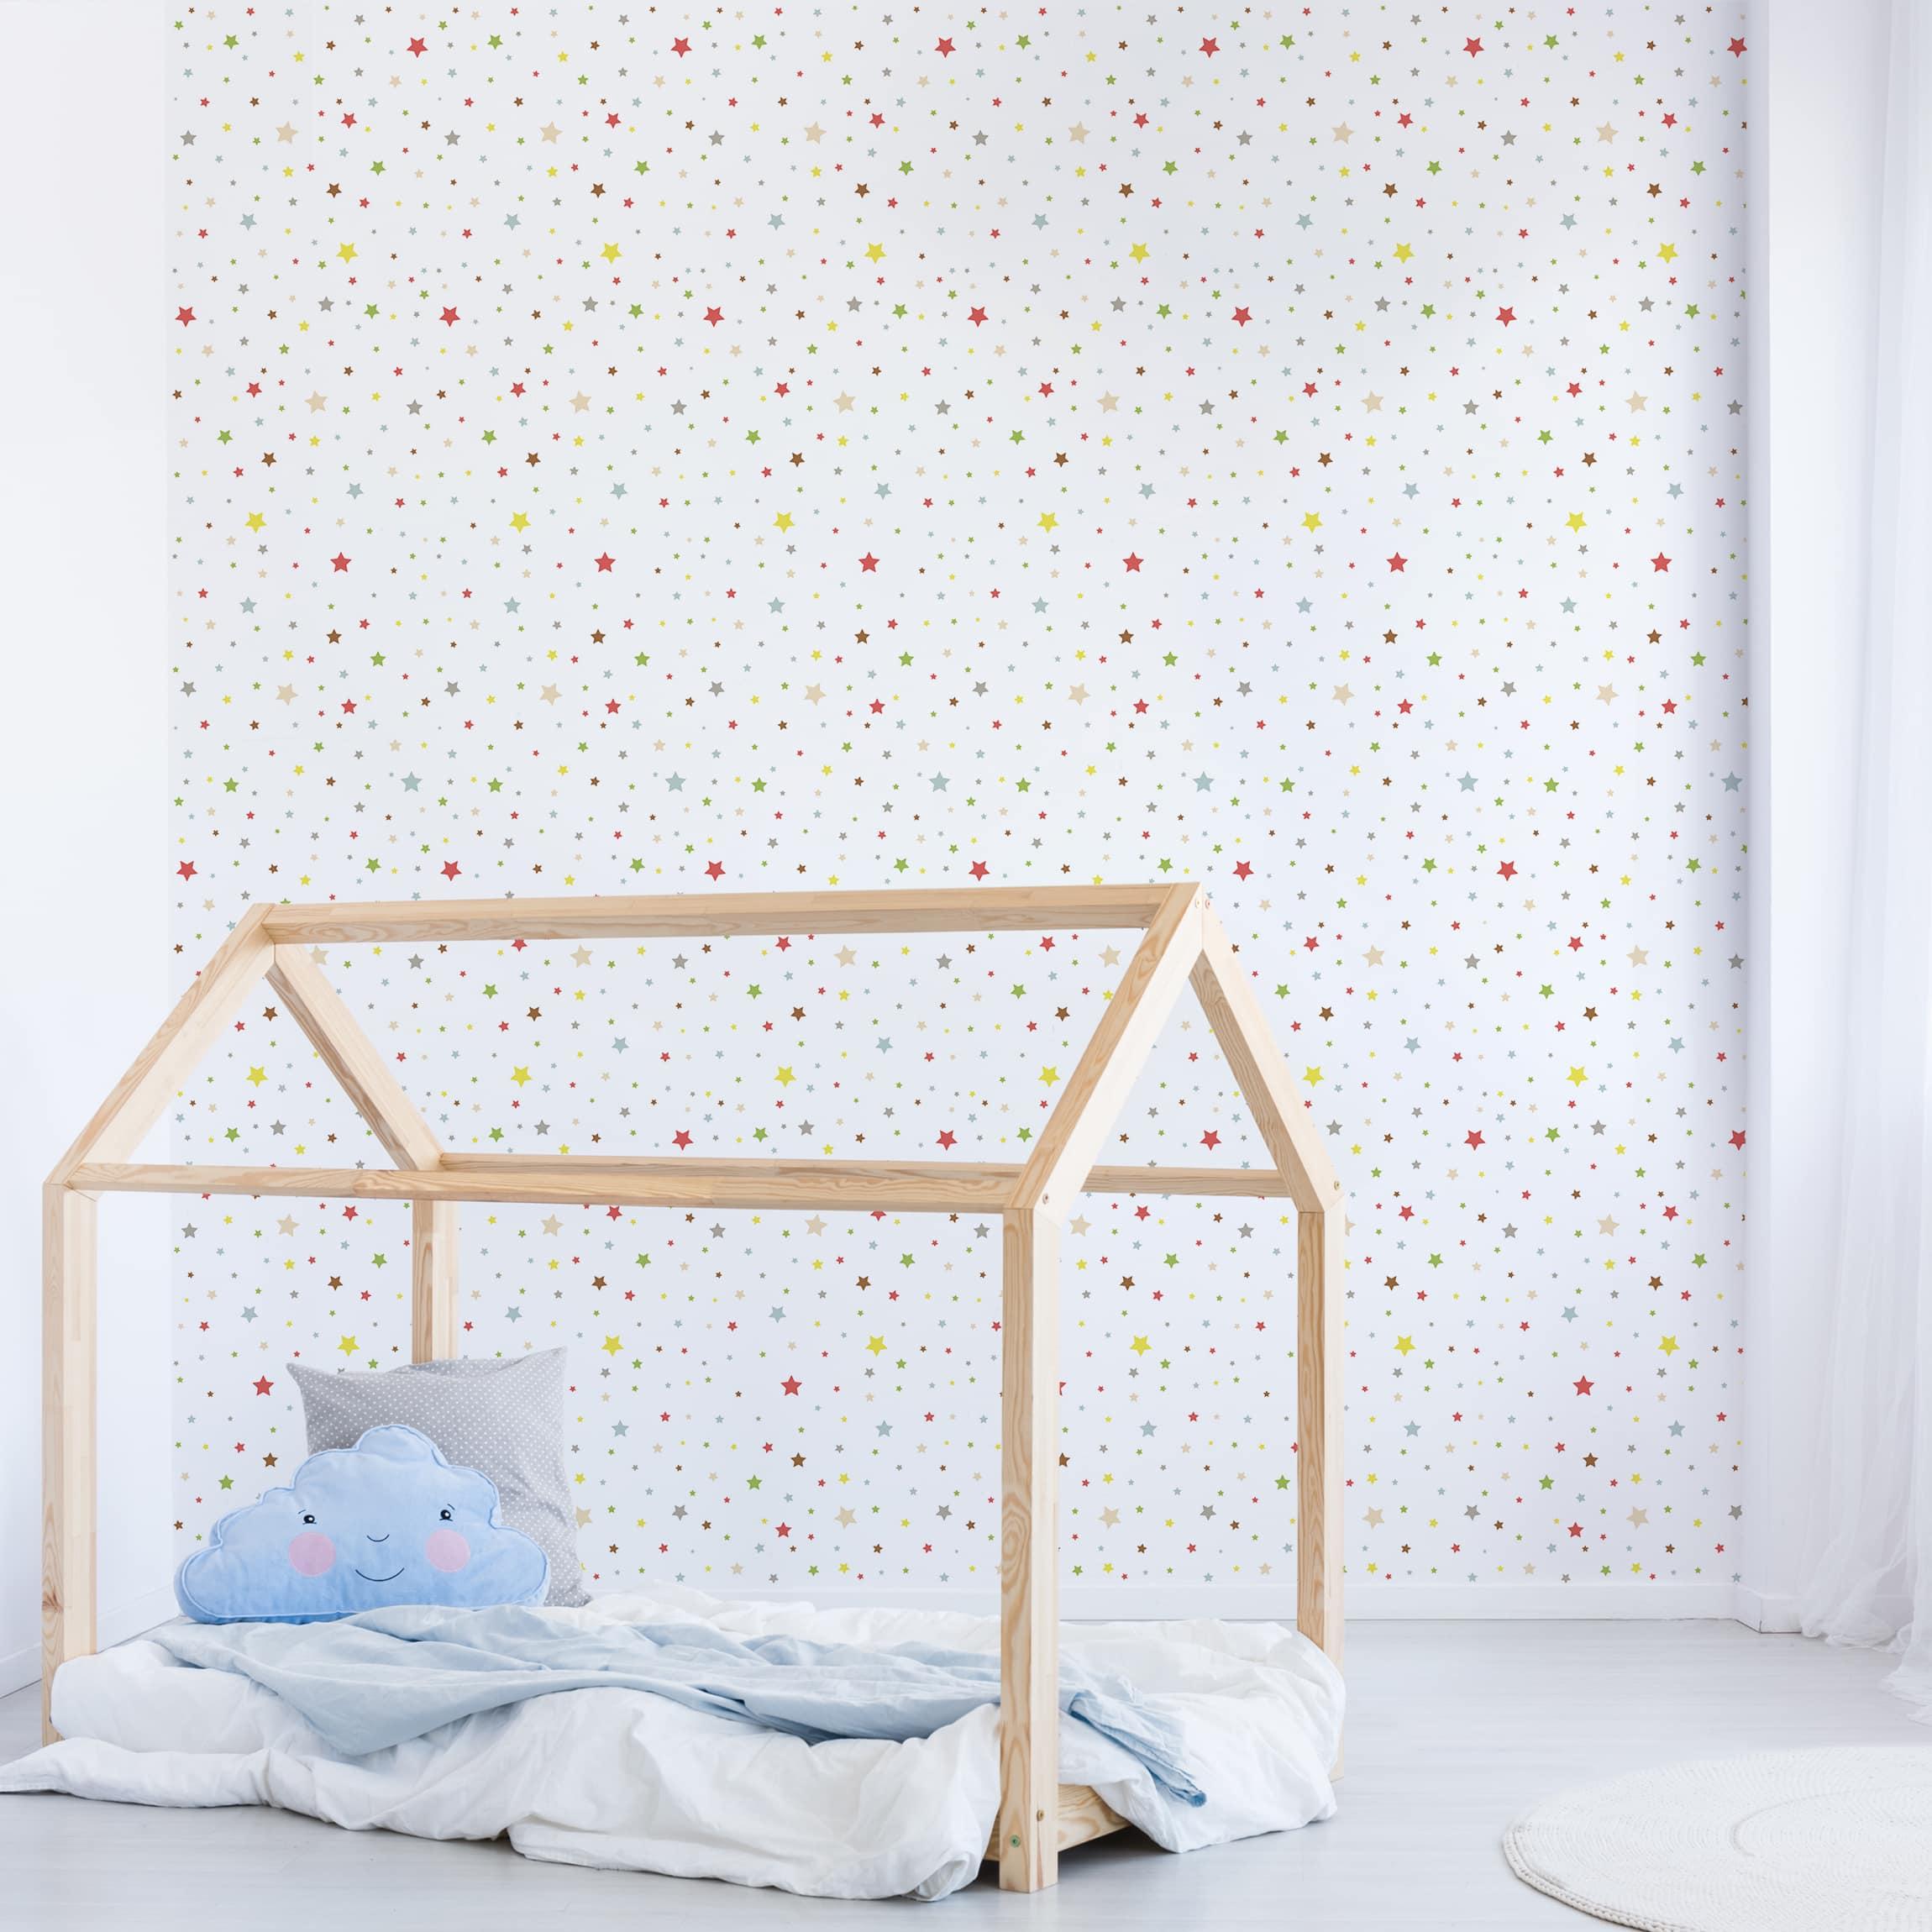 Selbstklebende Tapete Kinderzimmer - No.YK34 Bunte Sterne - Fototapete  Quadrat